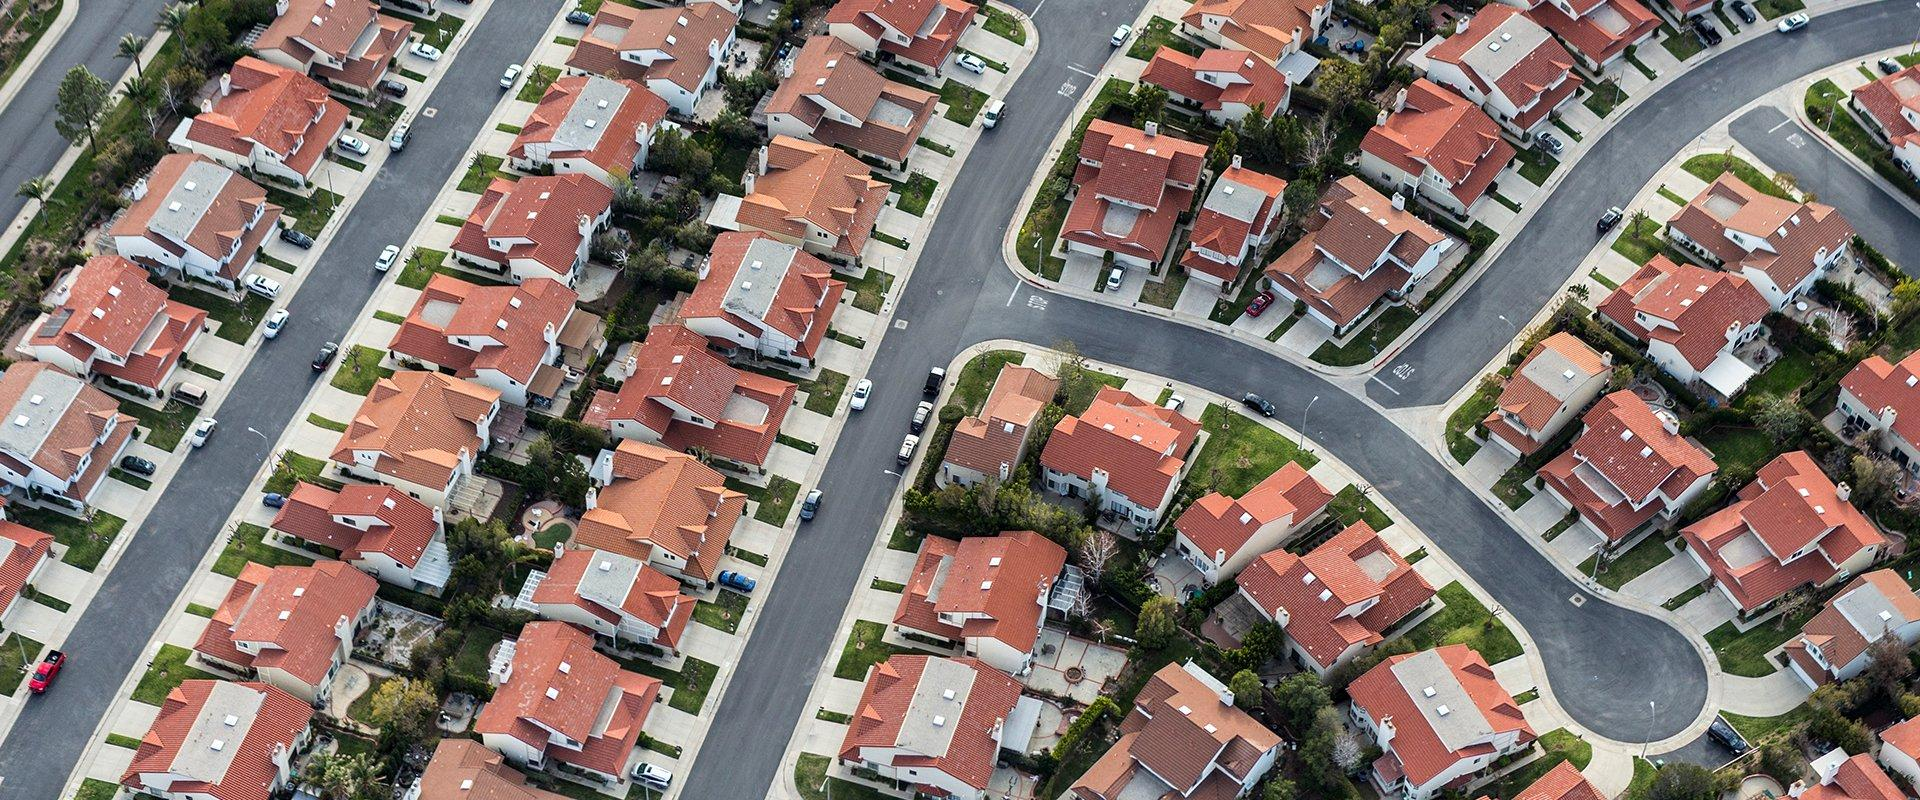 aerial view of a neighborhood in sacramento california